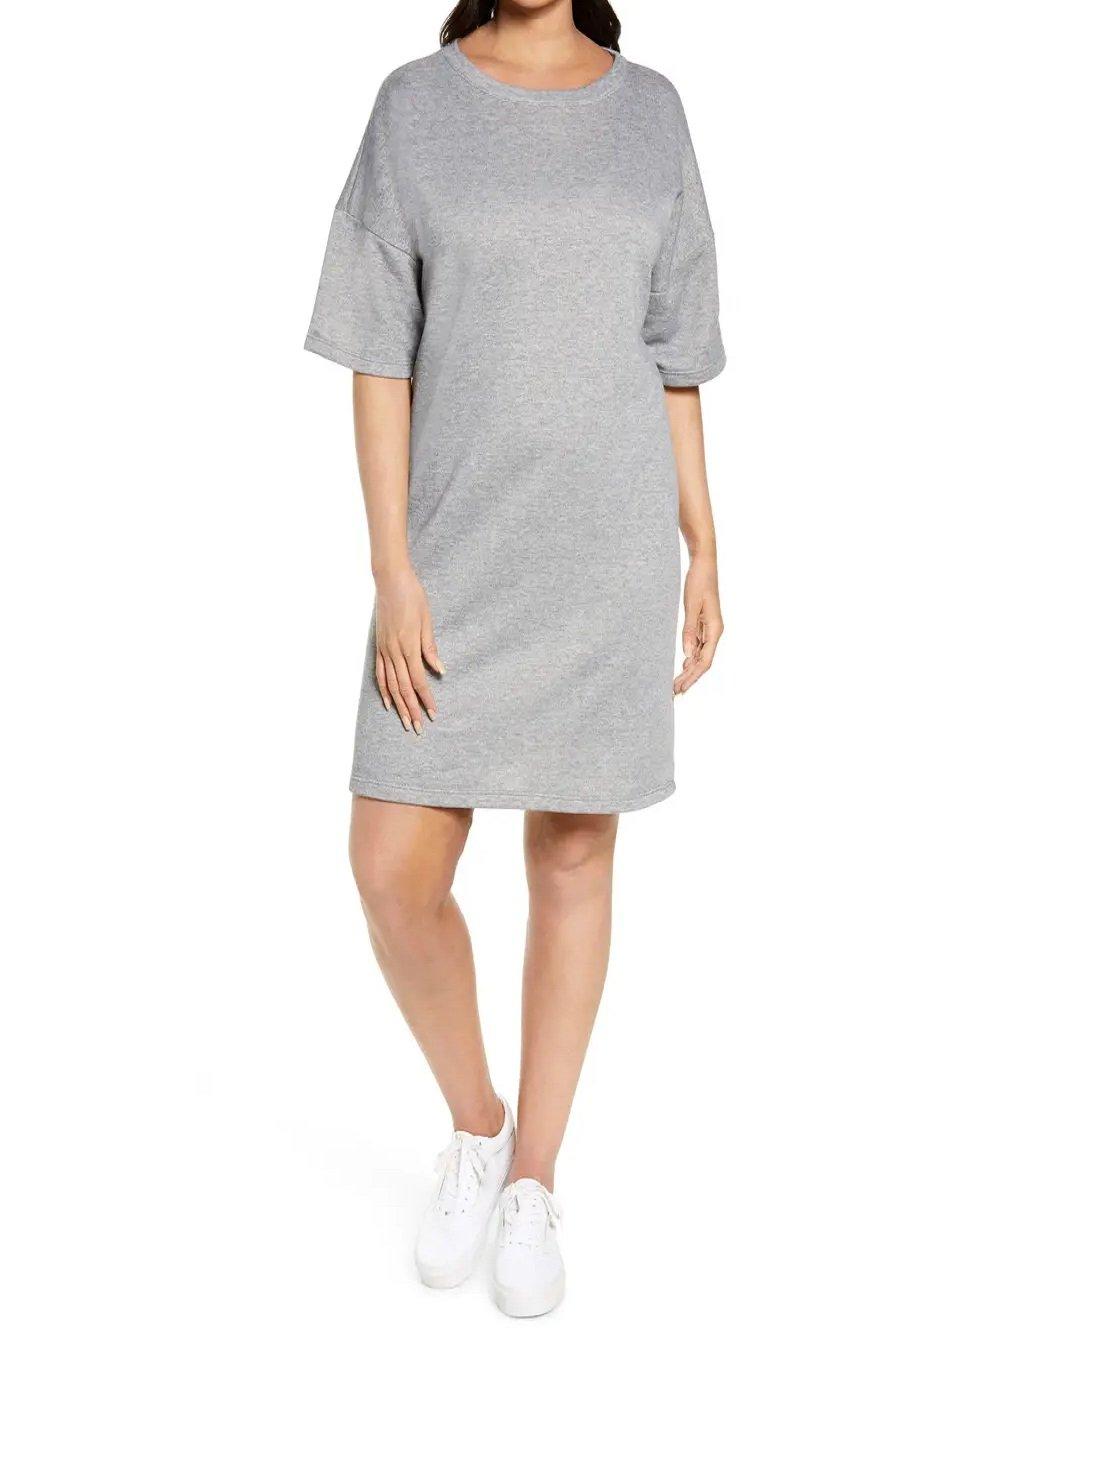 French T-Shirt Dress